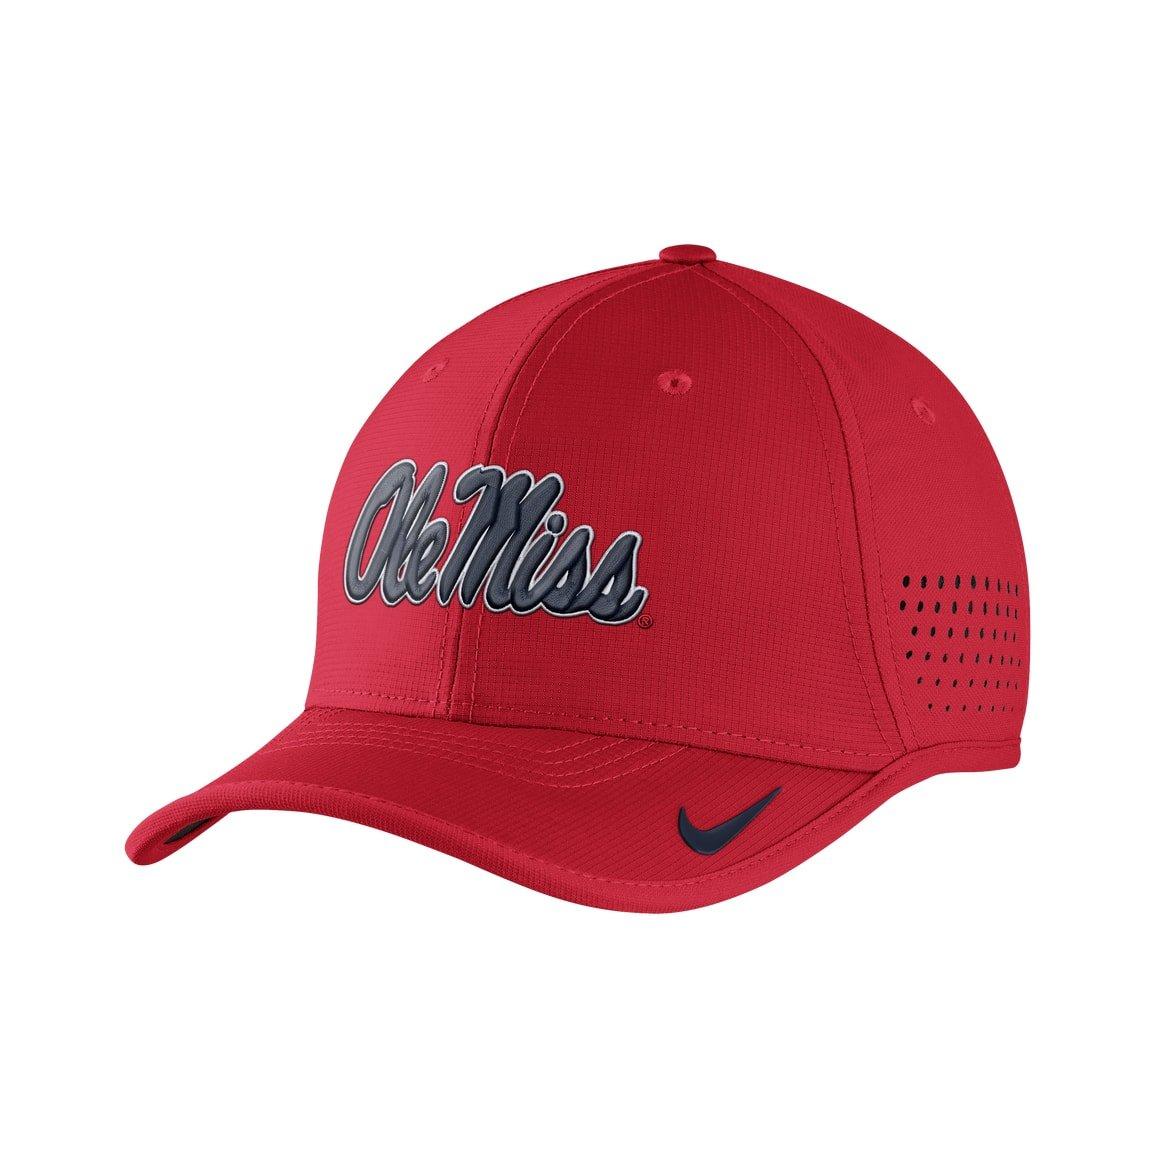 Amazon.com : Nike Vapor Coaches Adjustable Sideline Hat (Oklahoma) : Sports  & Outdoors